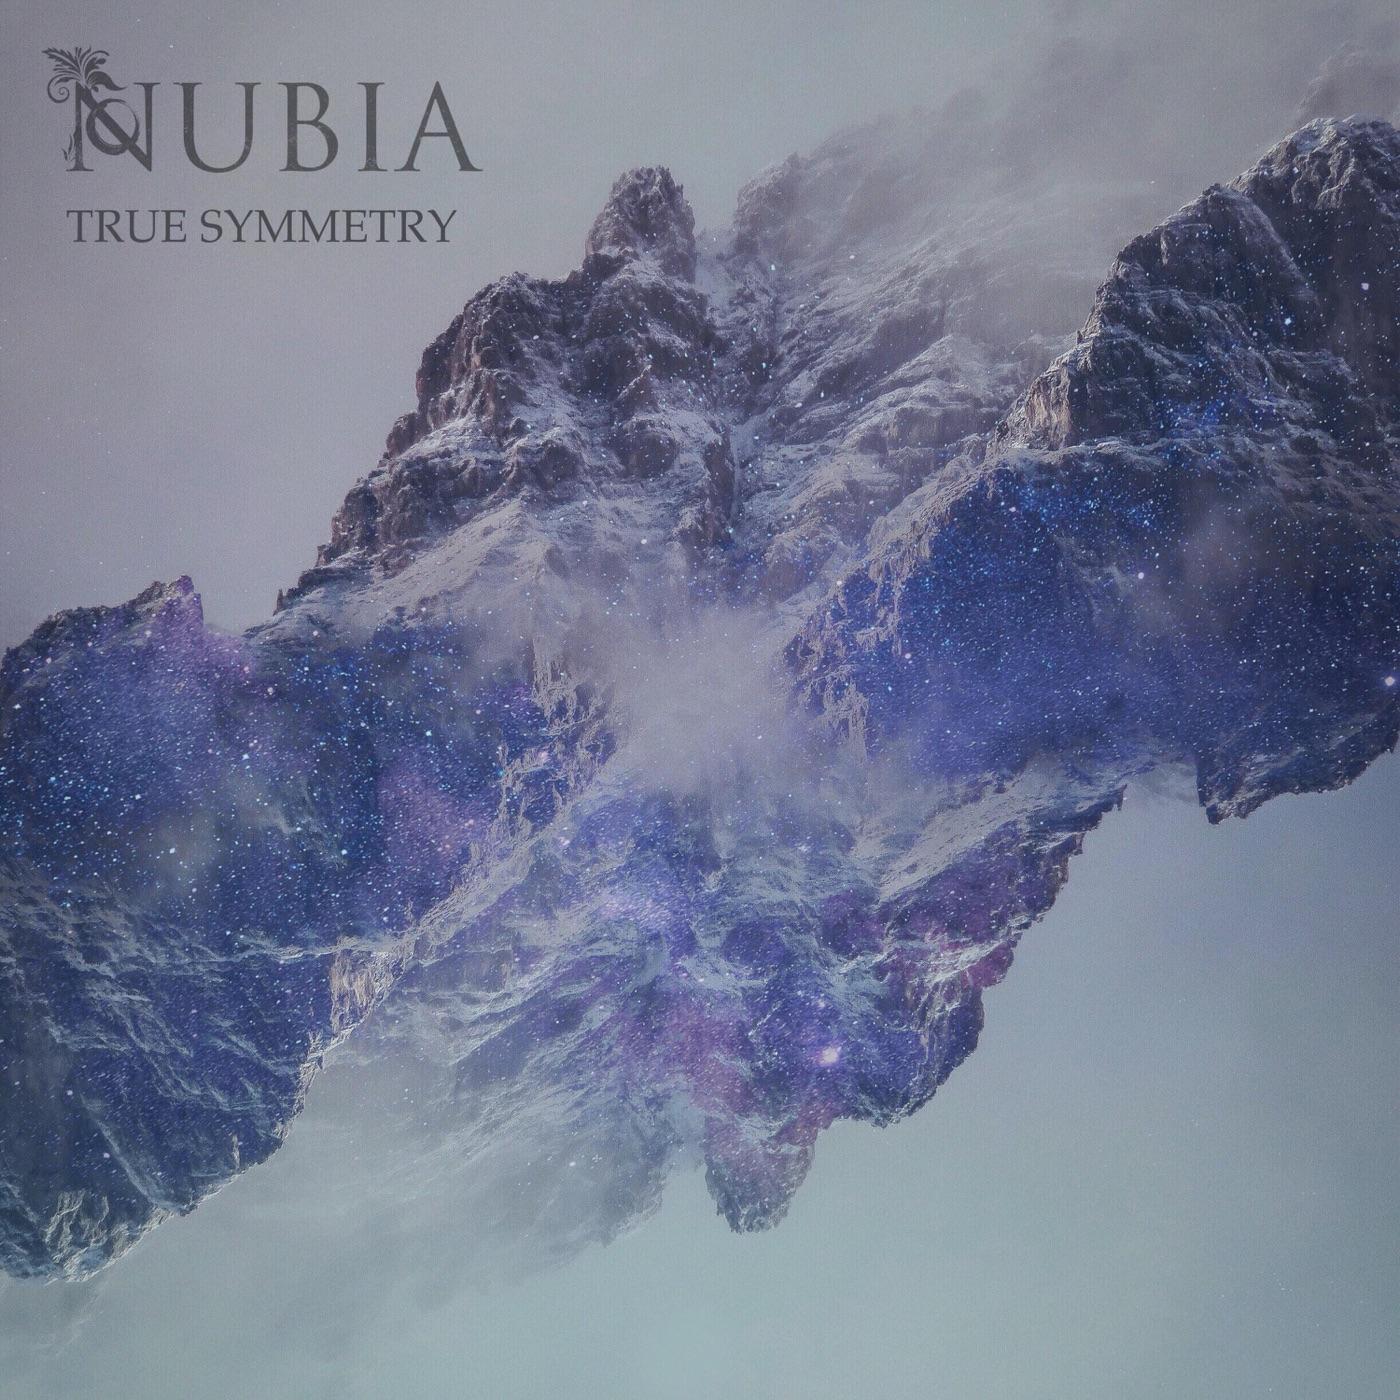 Nubia - True Symmetry [EP] (2018)